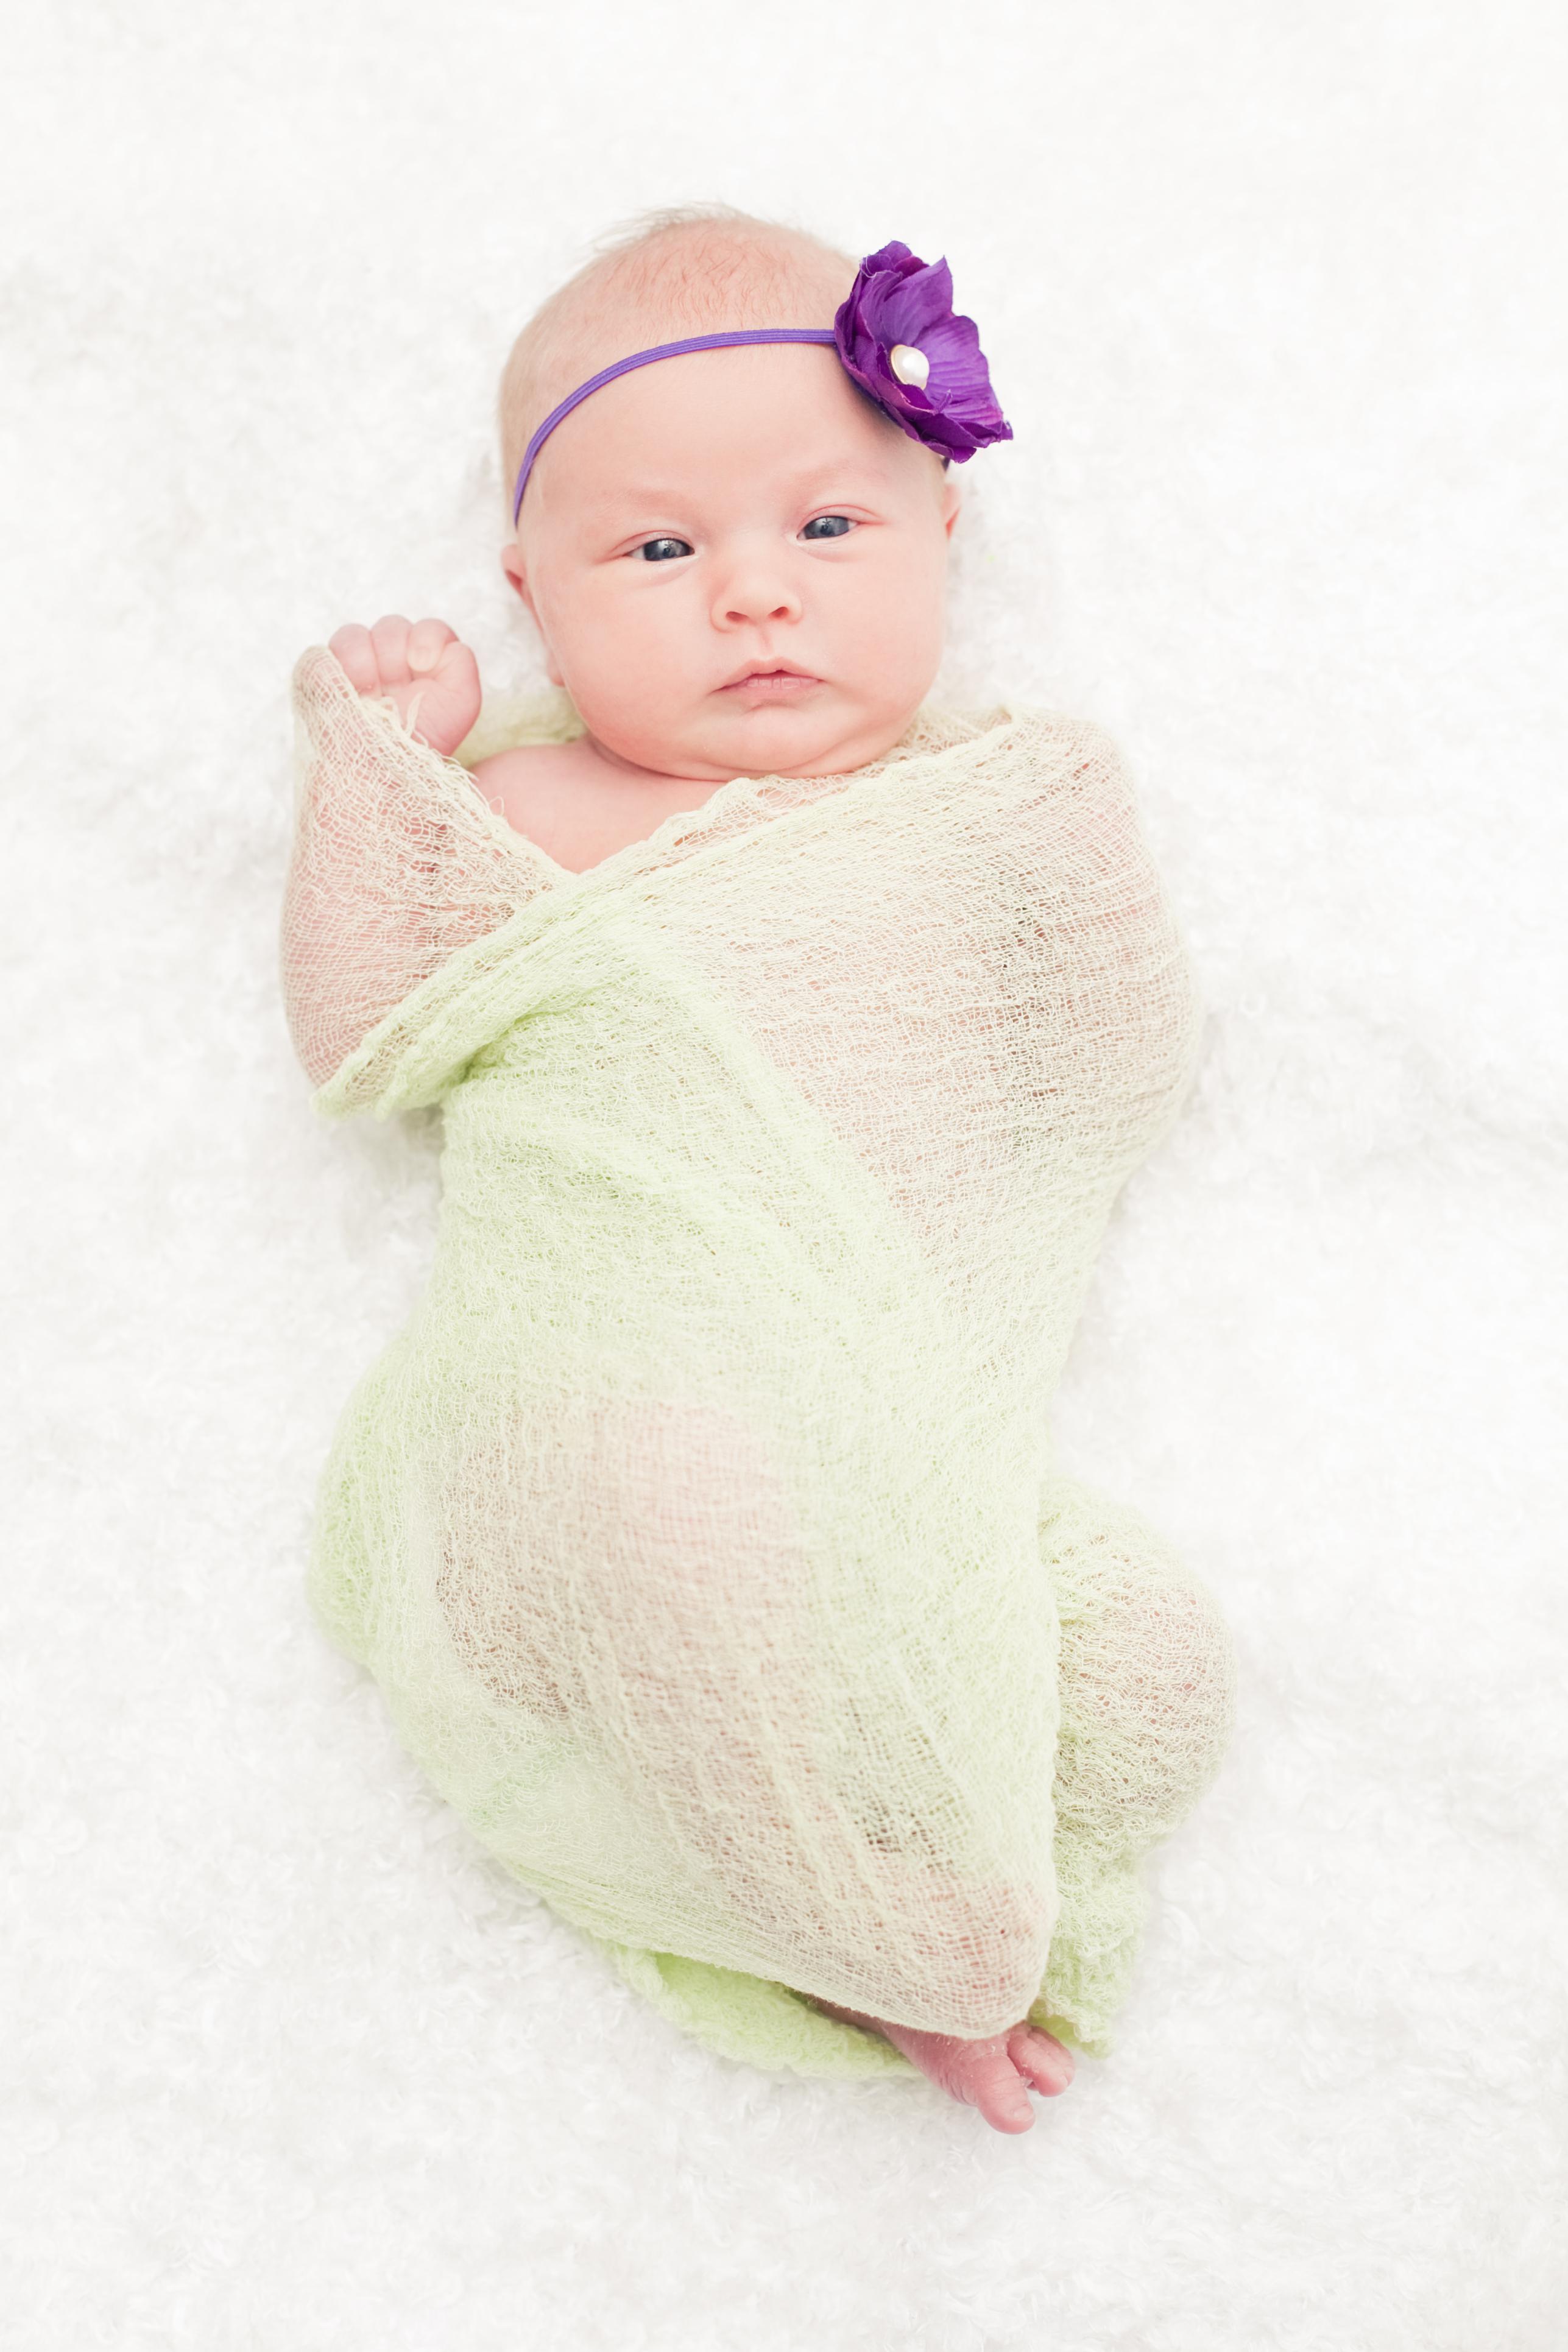 k.newborns-12-edit.jpg